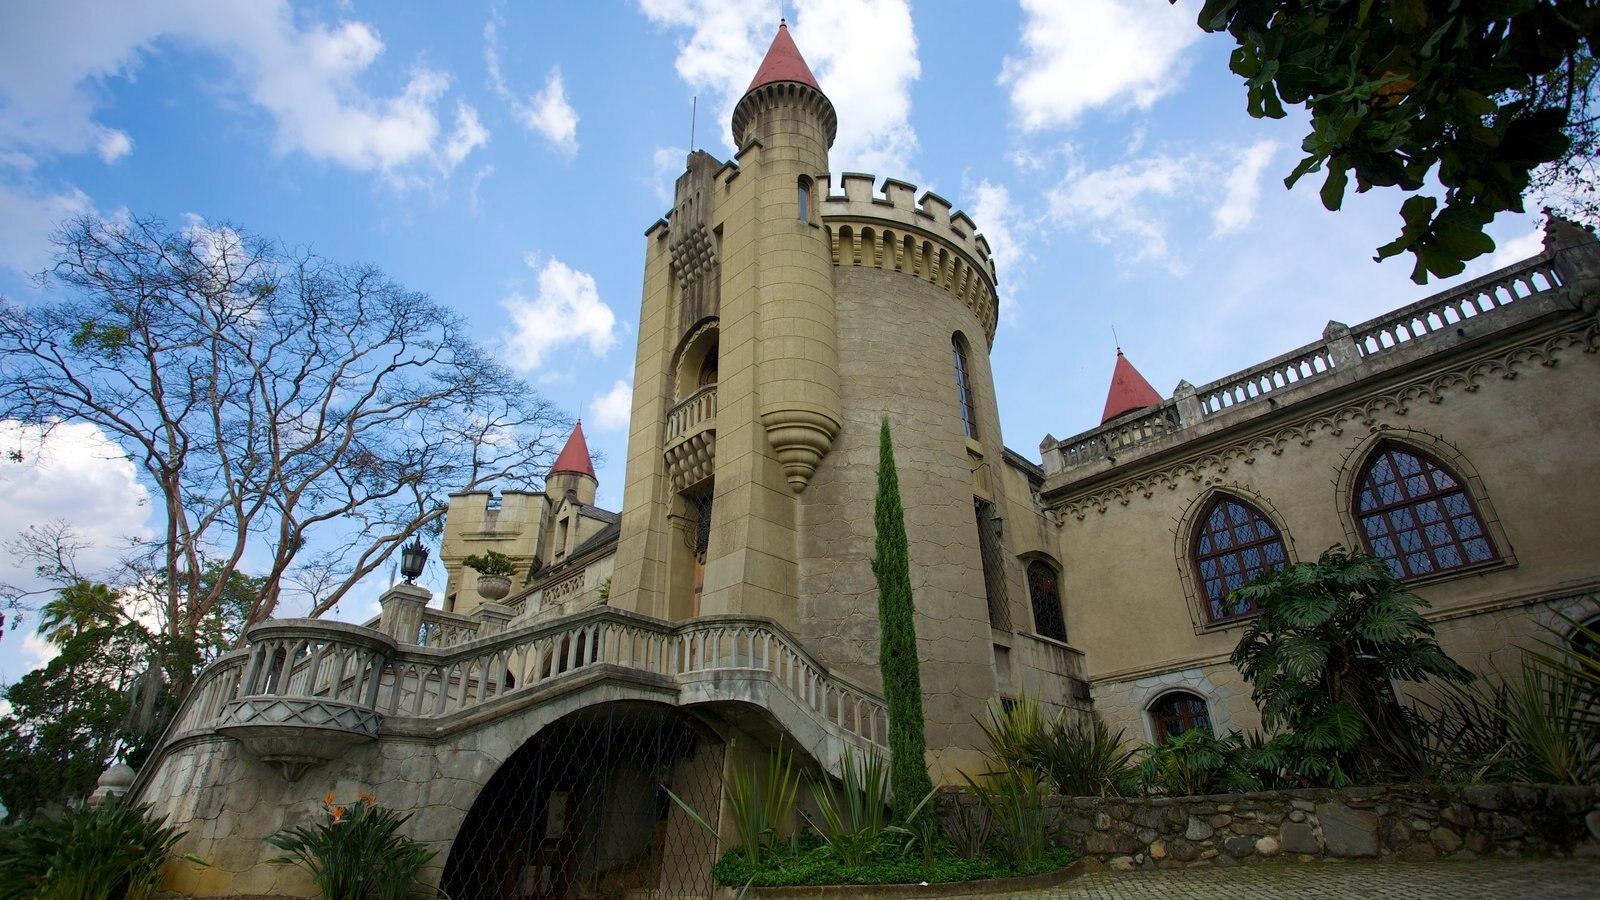 Museo El Castillo caracterizando um pequeno castelo ou palácio e arquitetura de patrimônio